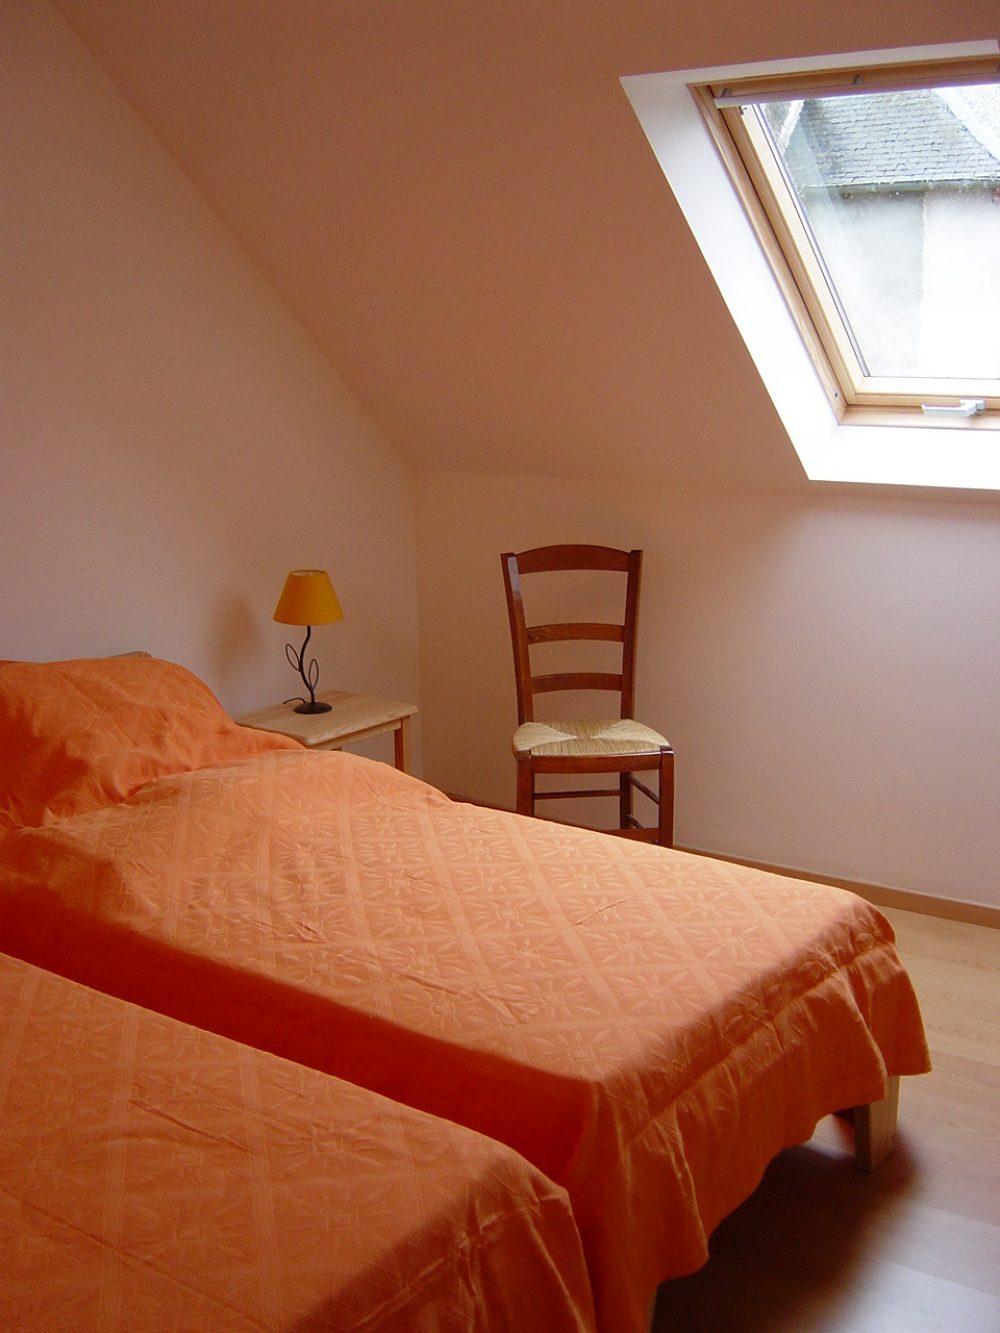 Bed And Breakfast in orange | Gîtes de France-Gîte d-Armor-Les rives ...